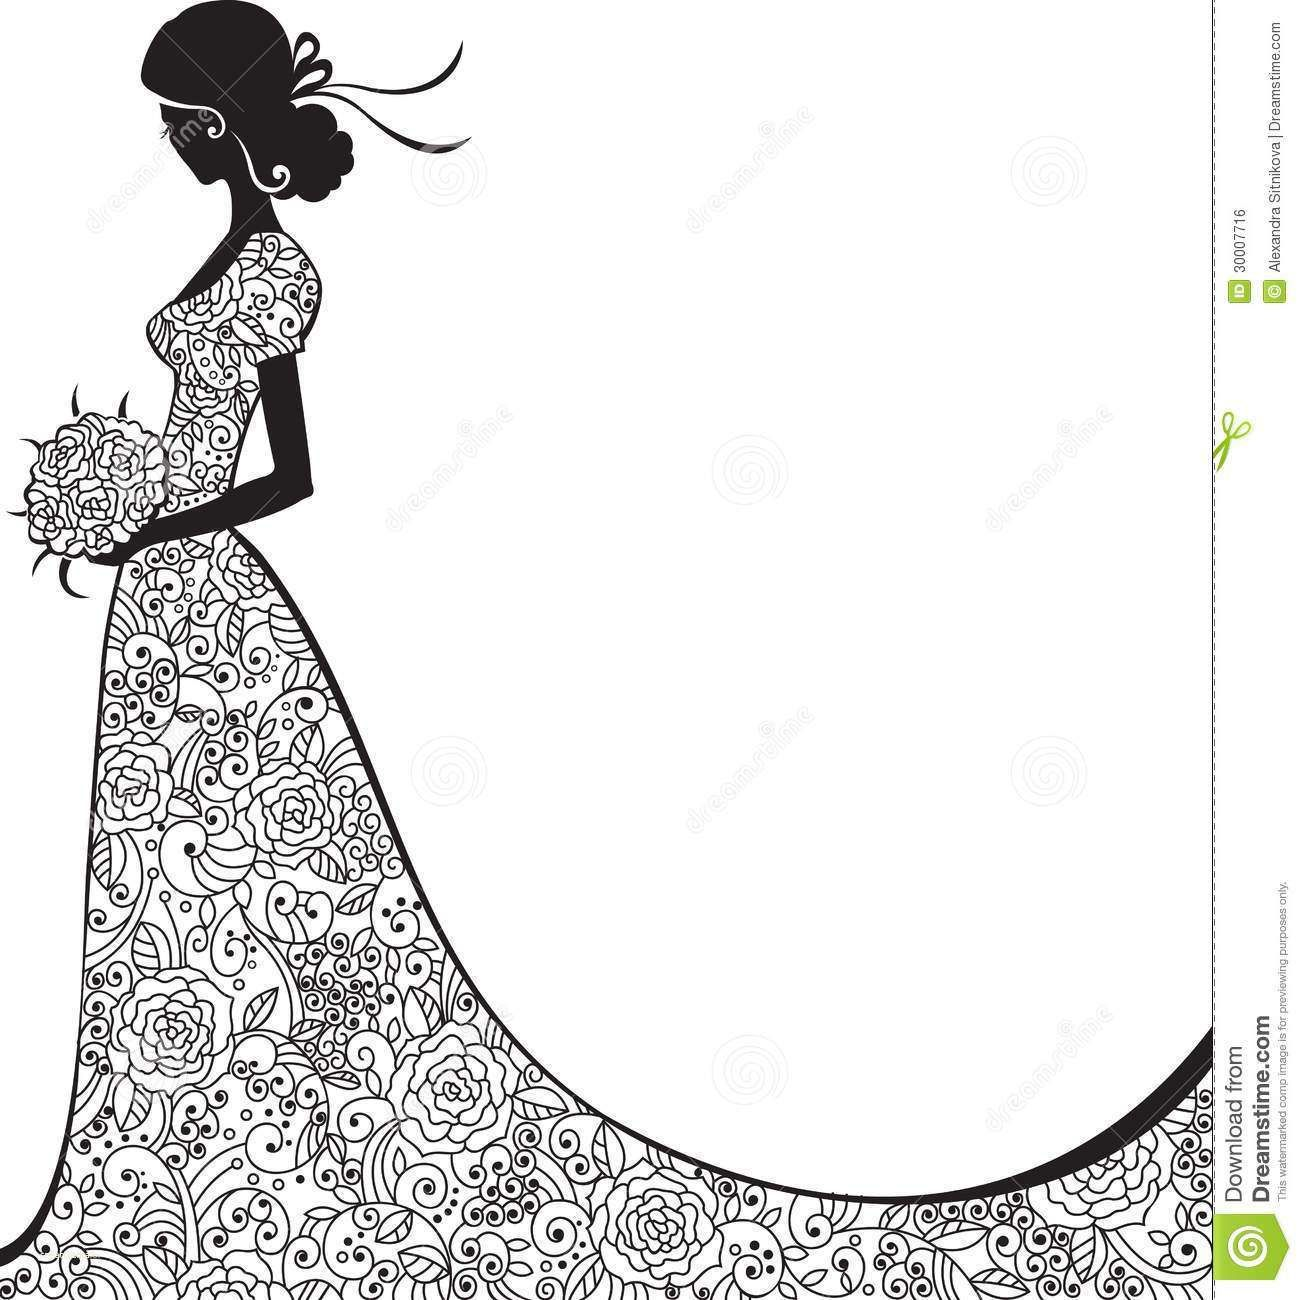 medium resolution of modern wedding clipart awesome modern wedding clipart 13 modern bridal bits baubles hey eep